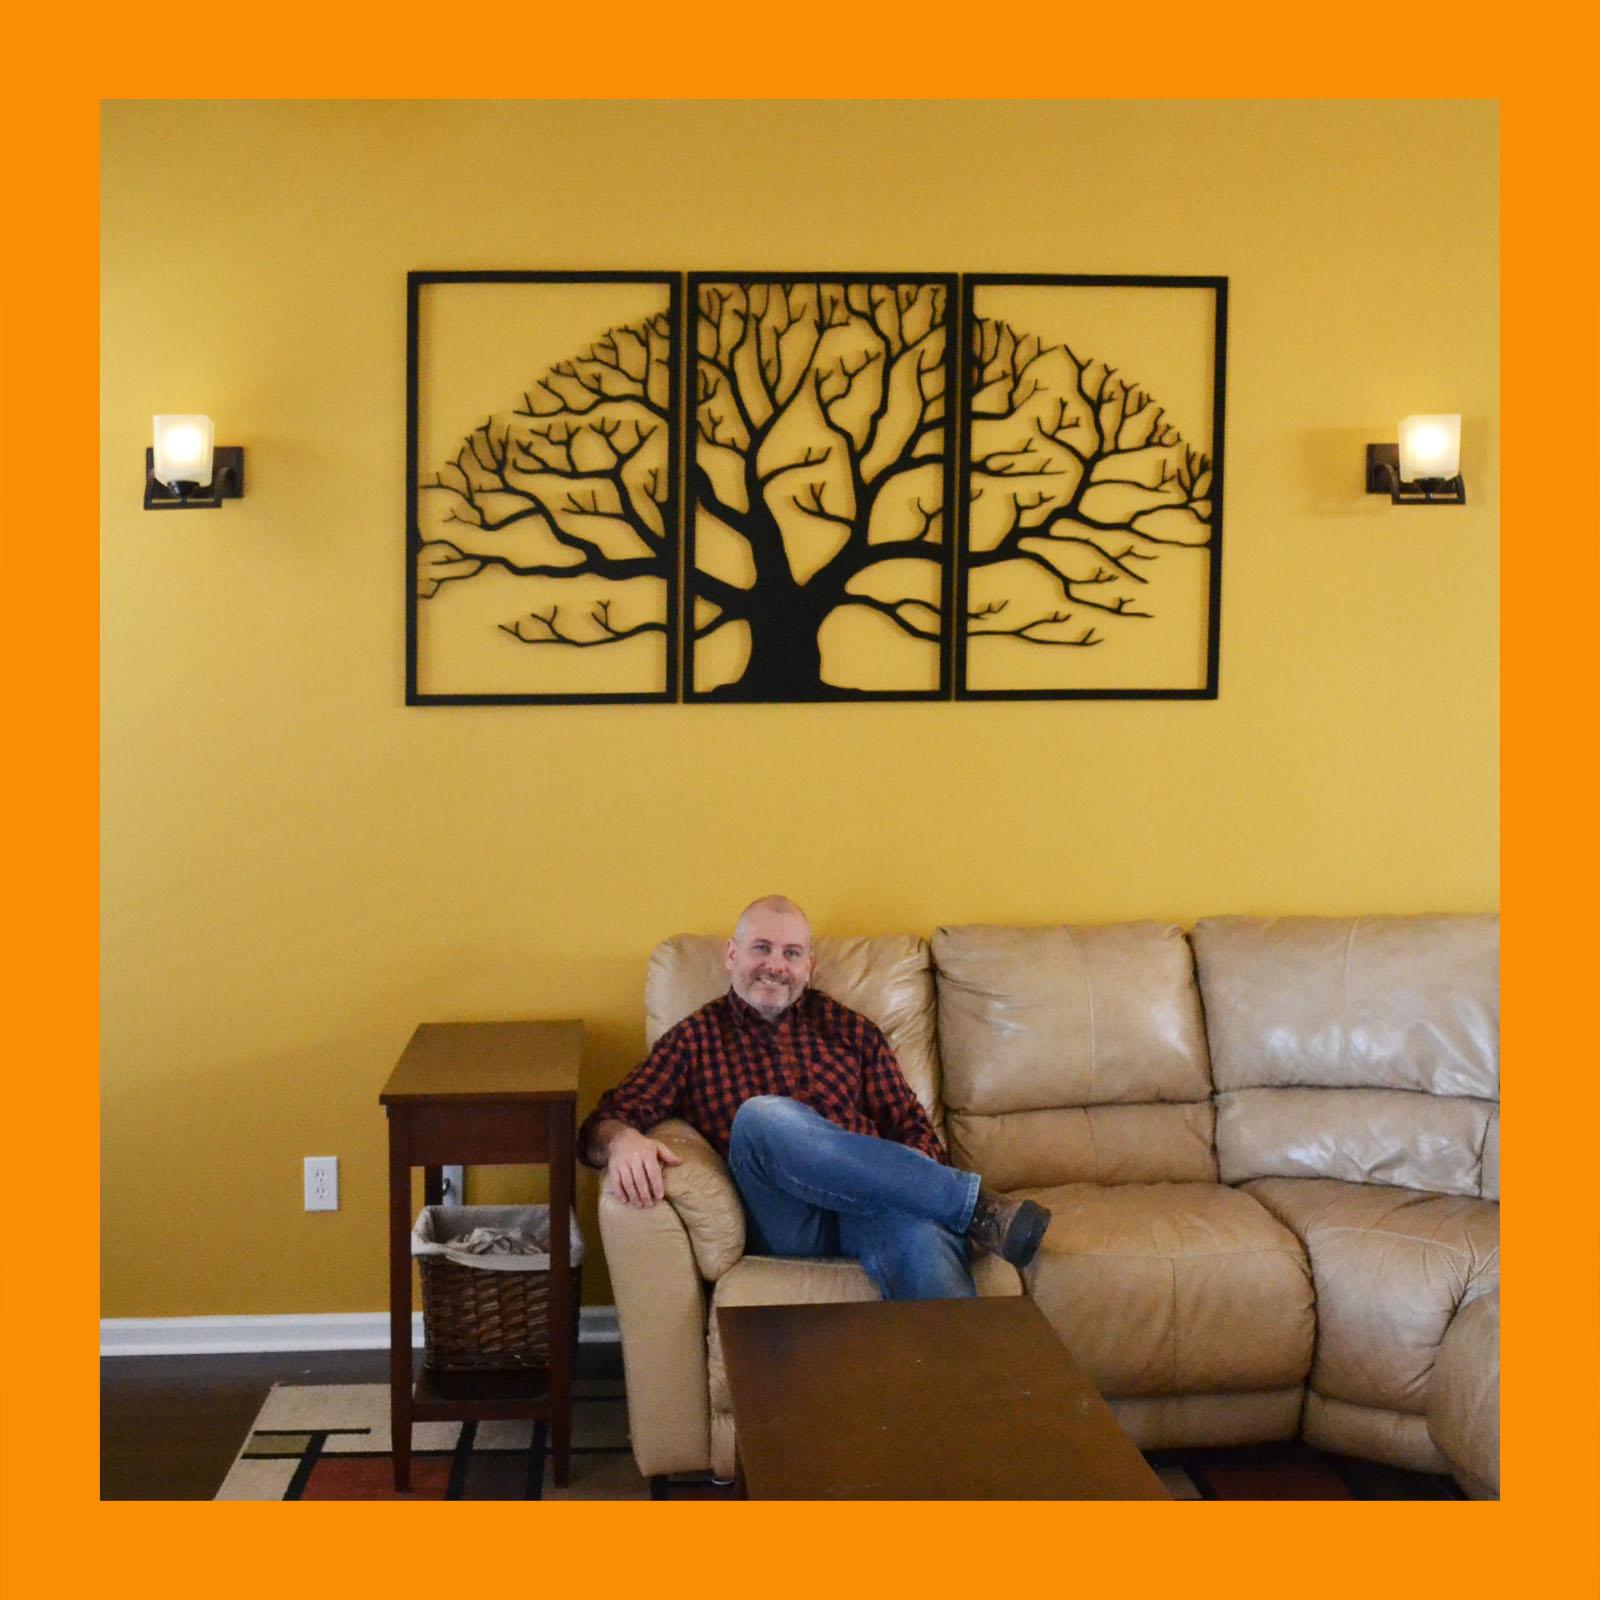 3 Piece Tree, Jumbo – More than a Handyman.